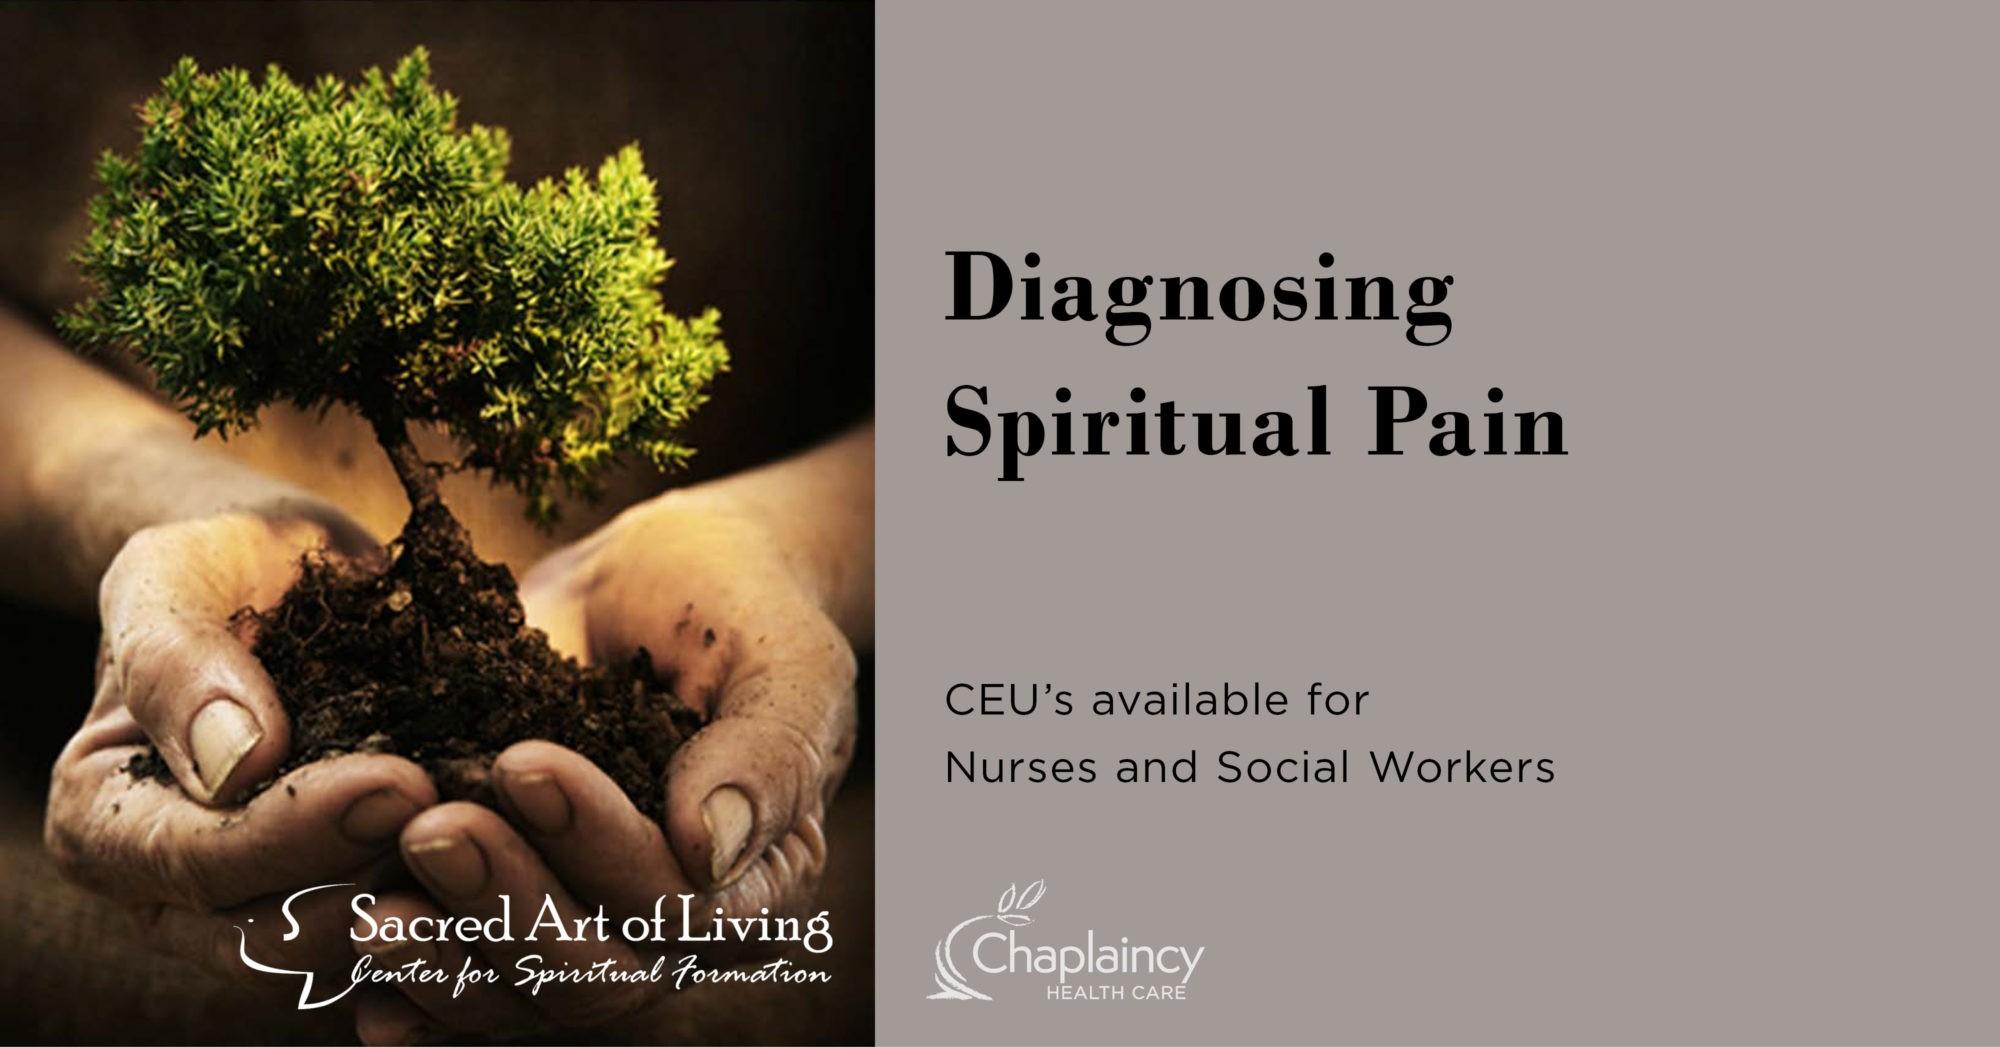 Diagnosing Spiritual Pain | Unit 2